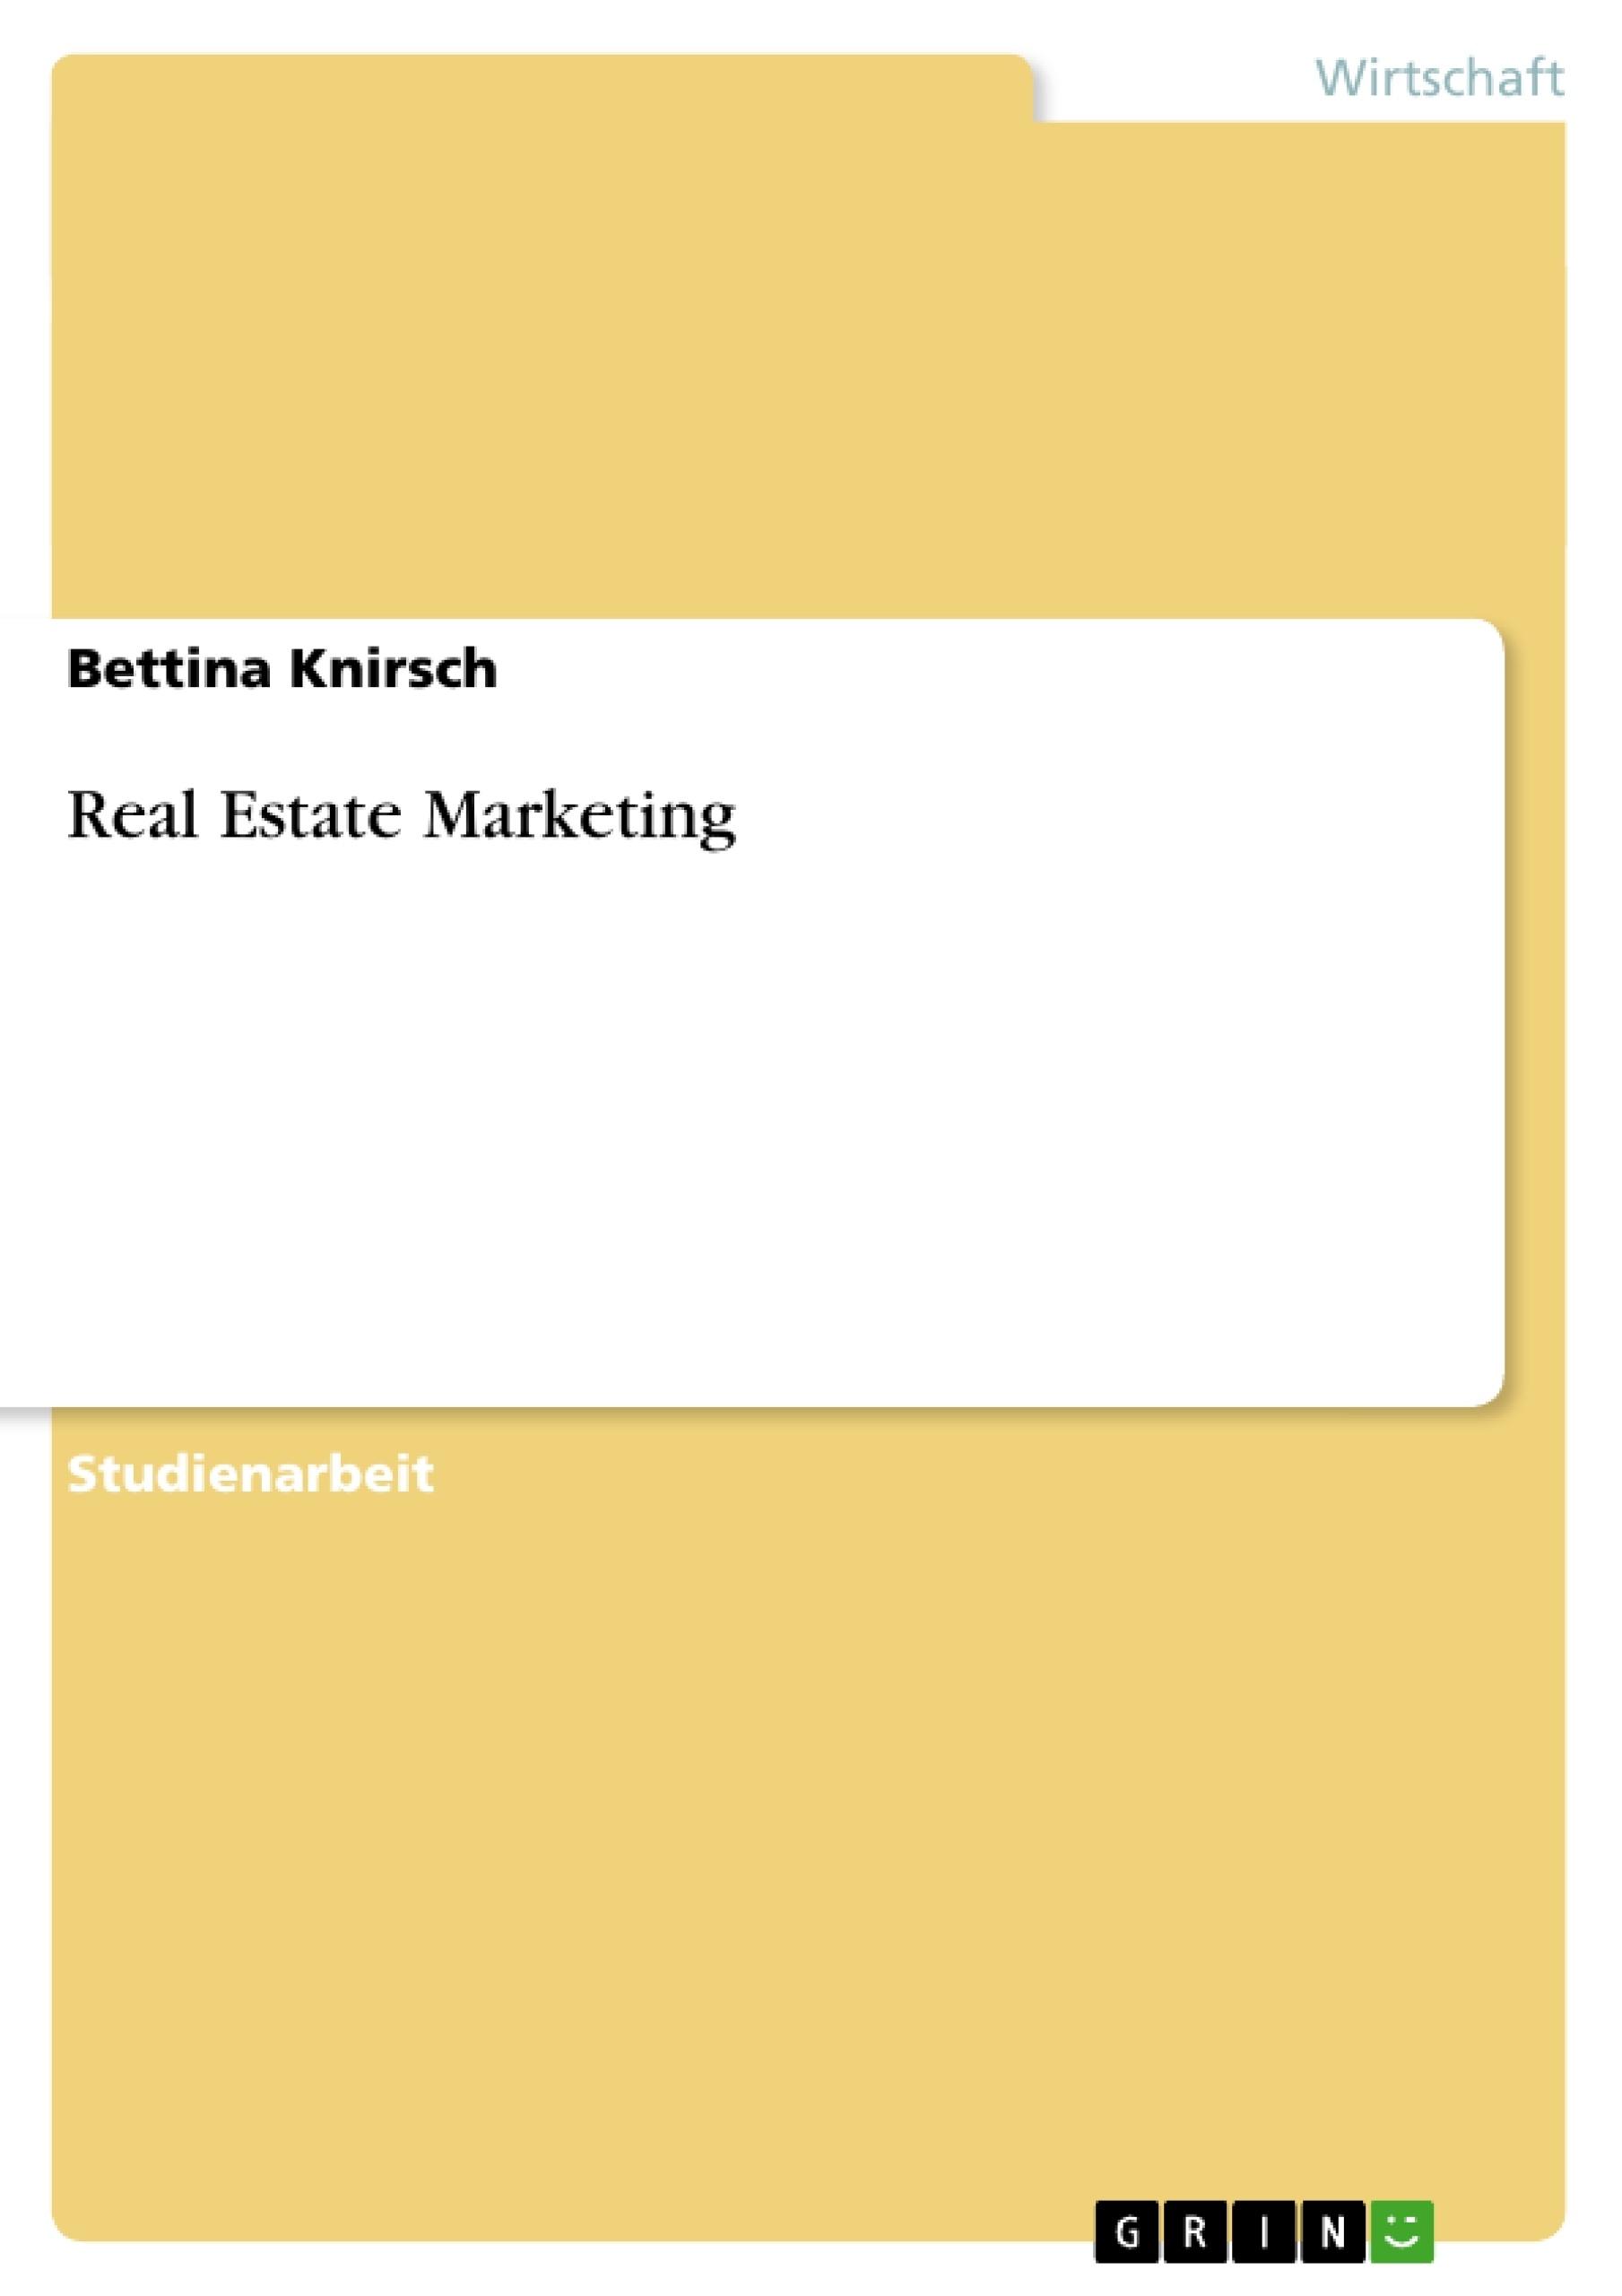 Titel: Real Estate Marketing